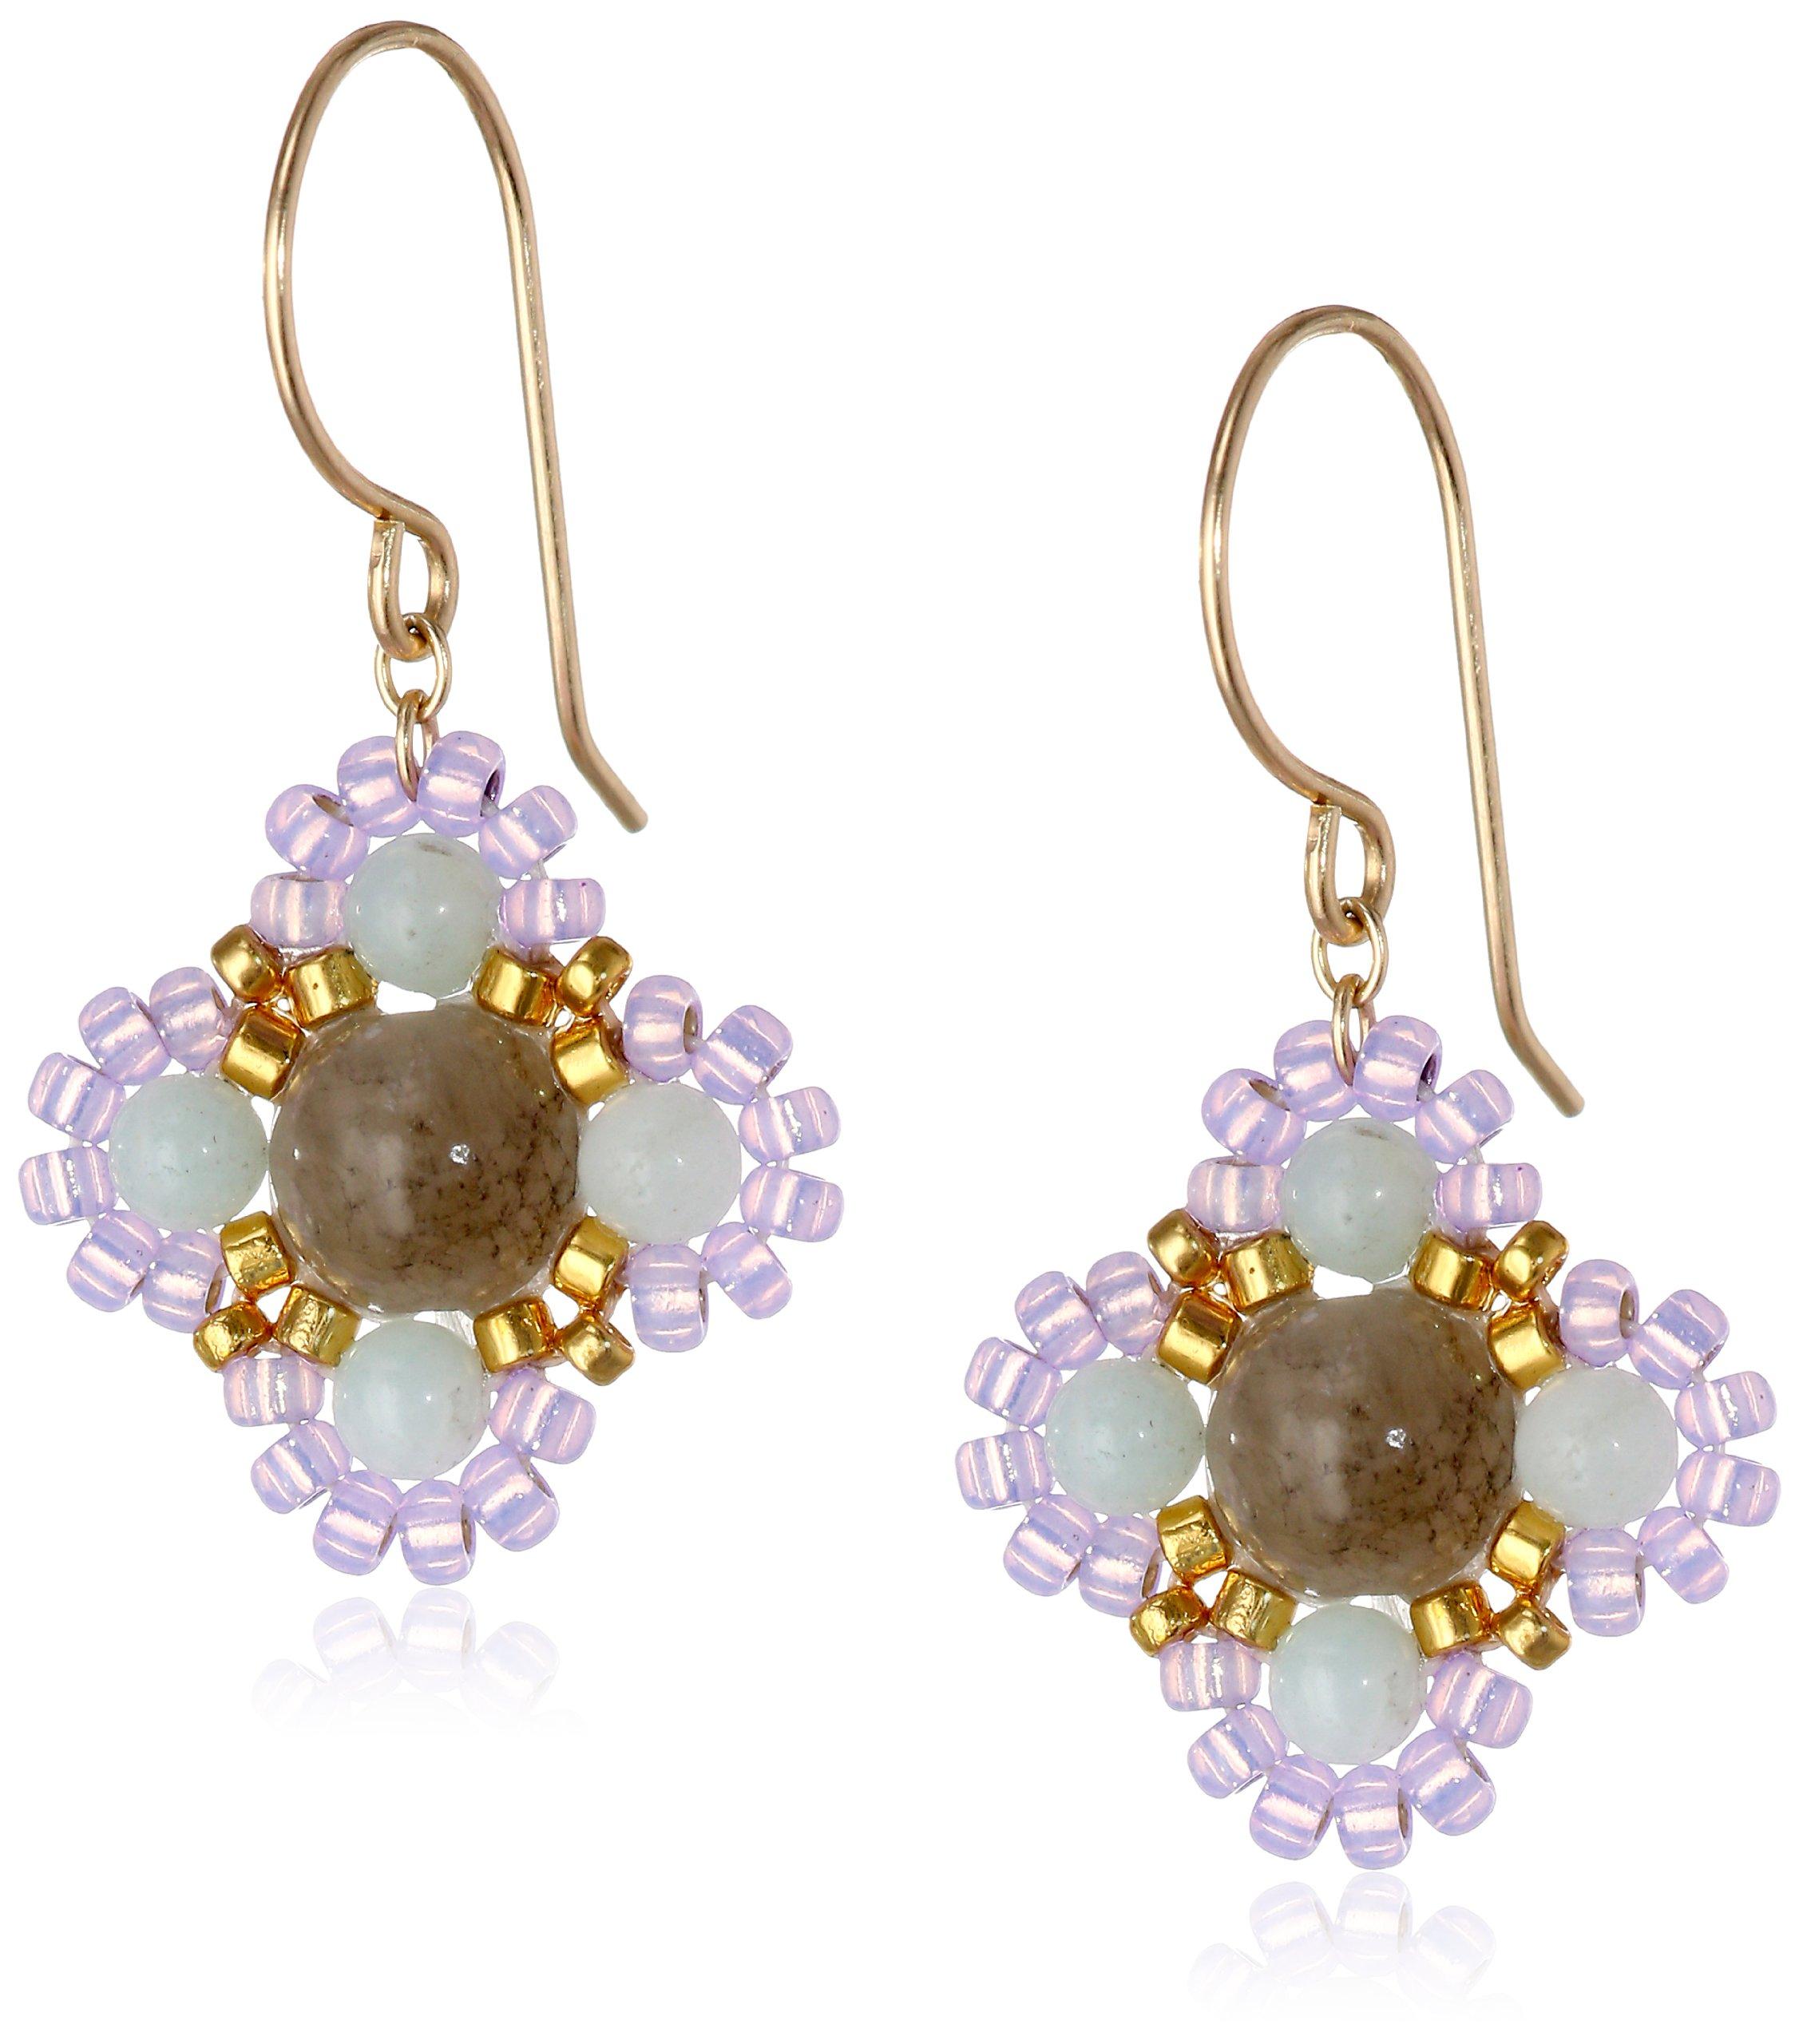 Miguel Ases Small Calcite and Quartz Miyuki Encased Flower Drop Earrings